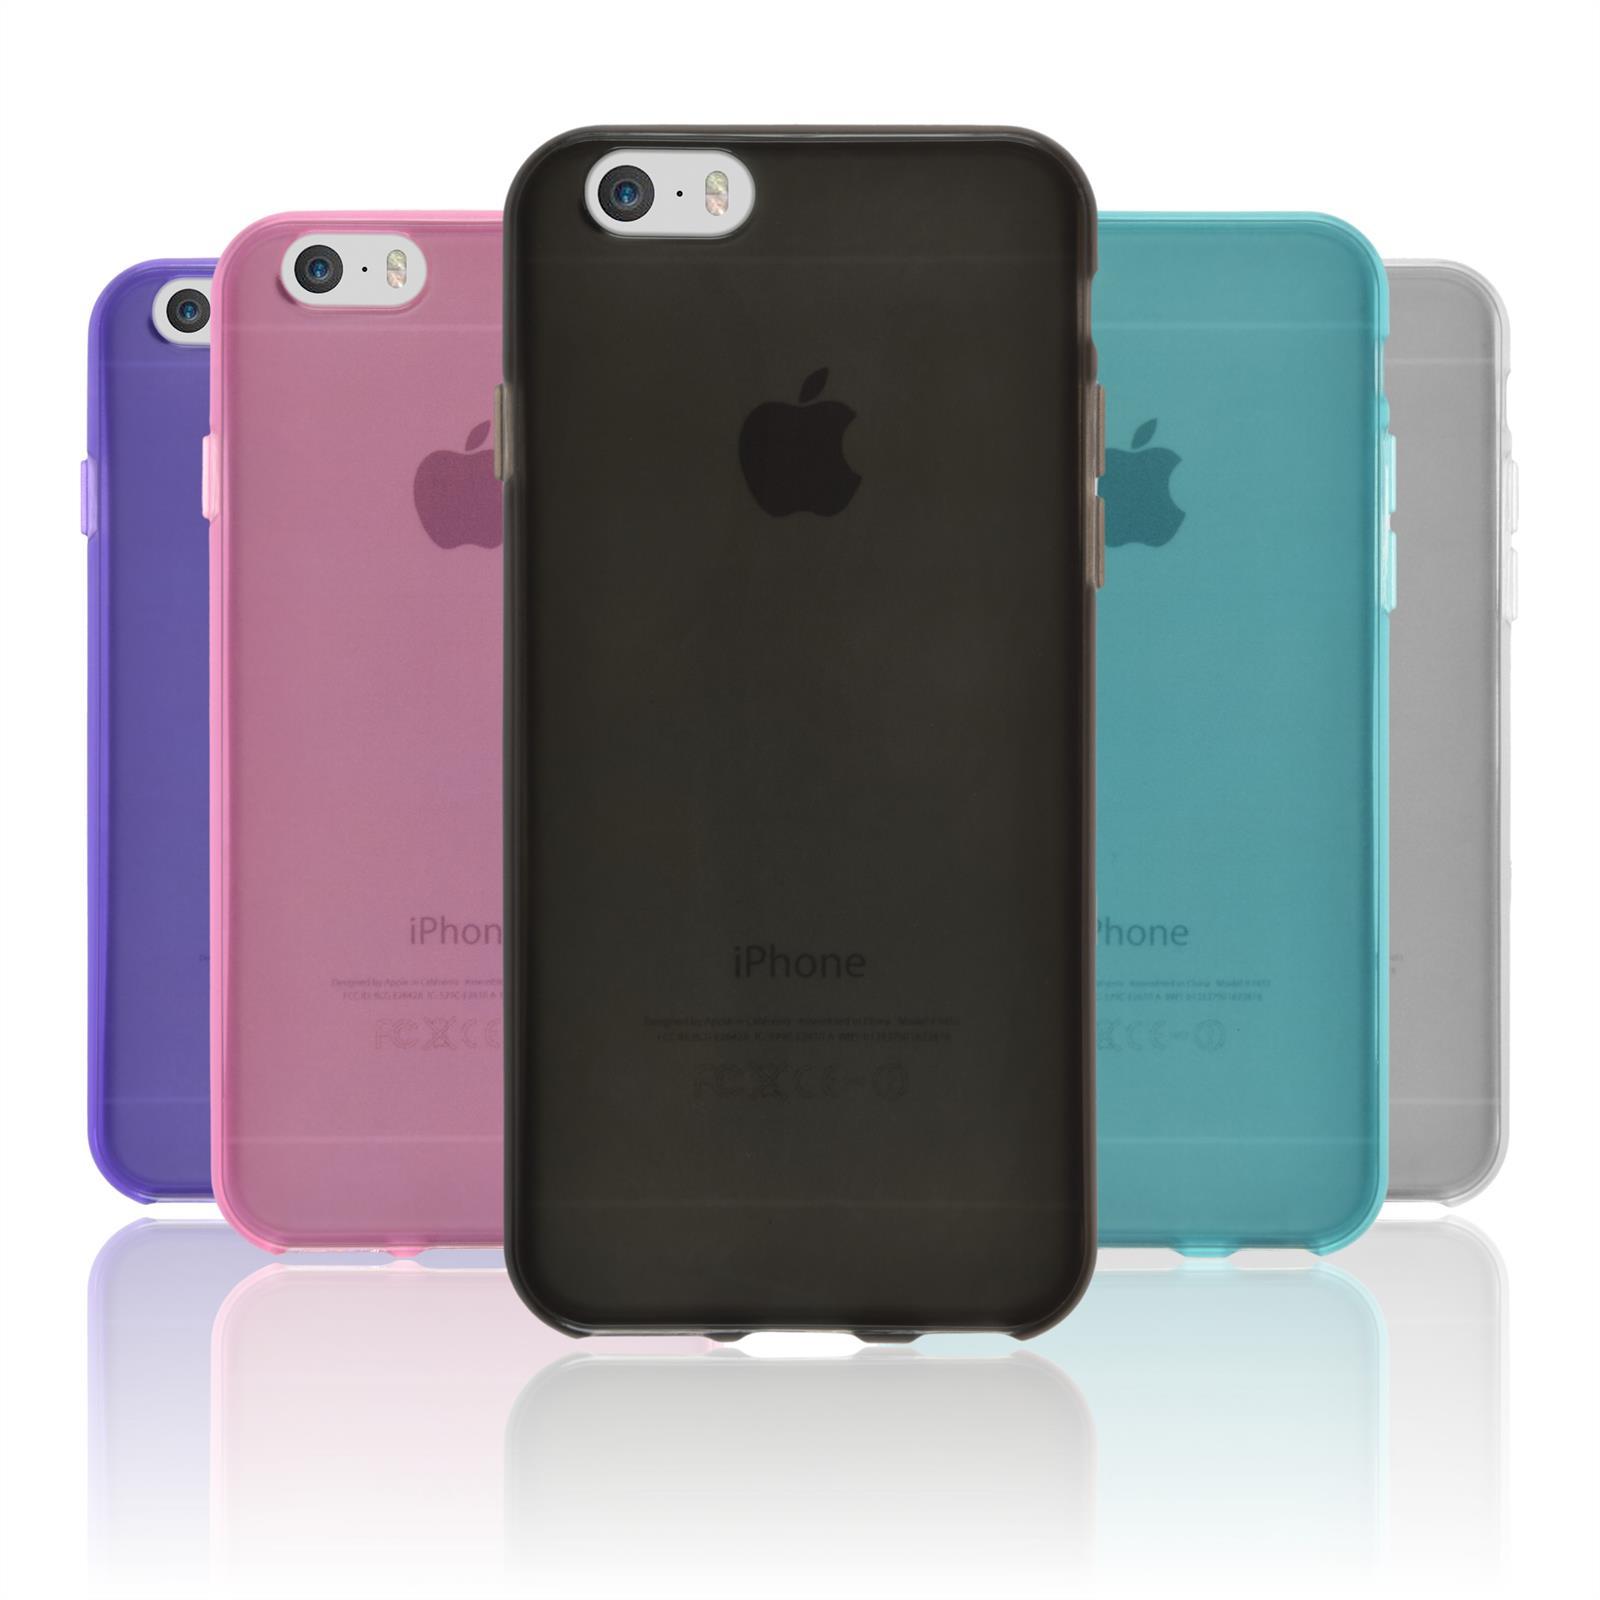 Silikonhülle für Apple iPhone 6s Plus / 6 Plus transparent